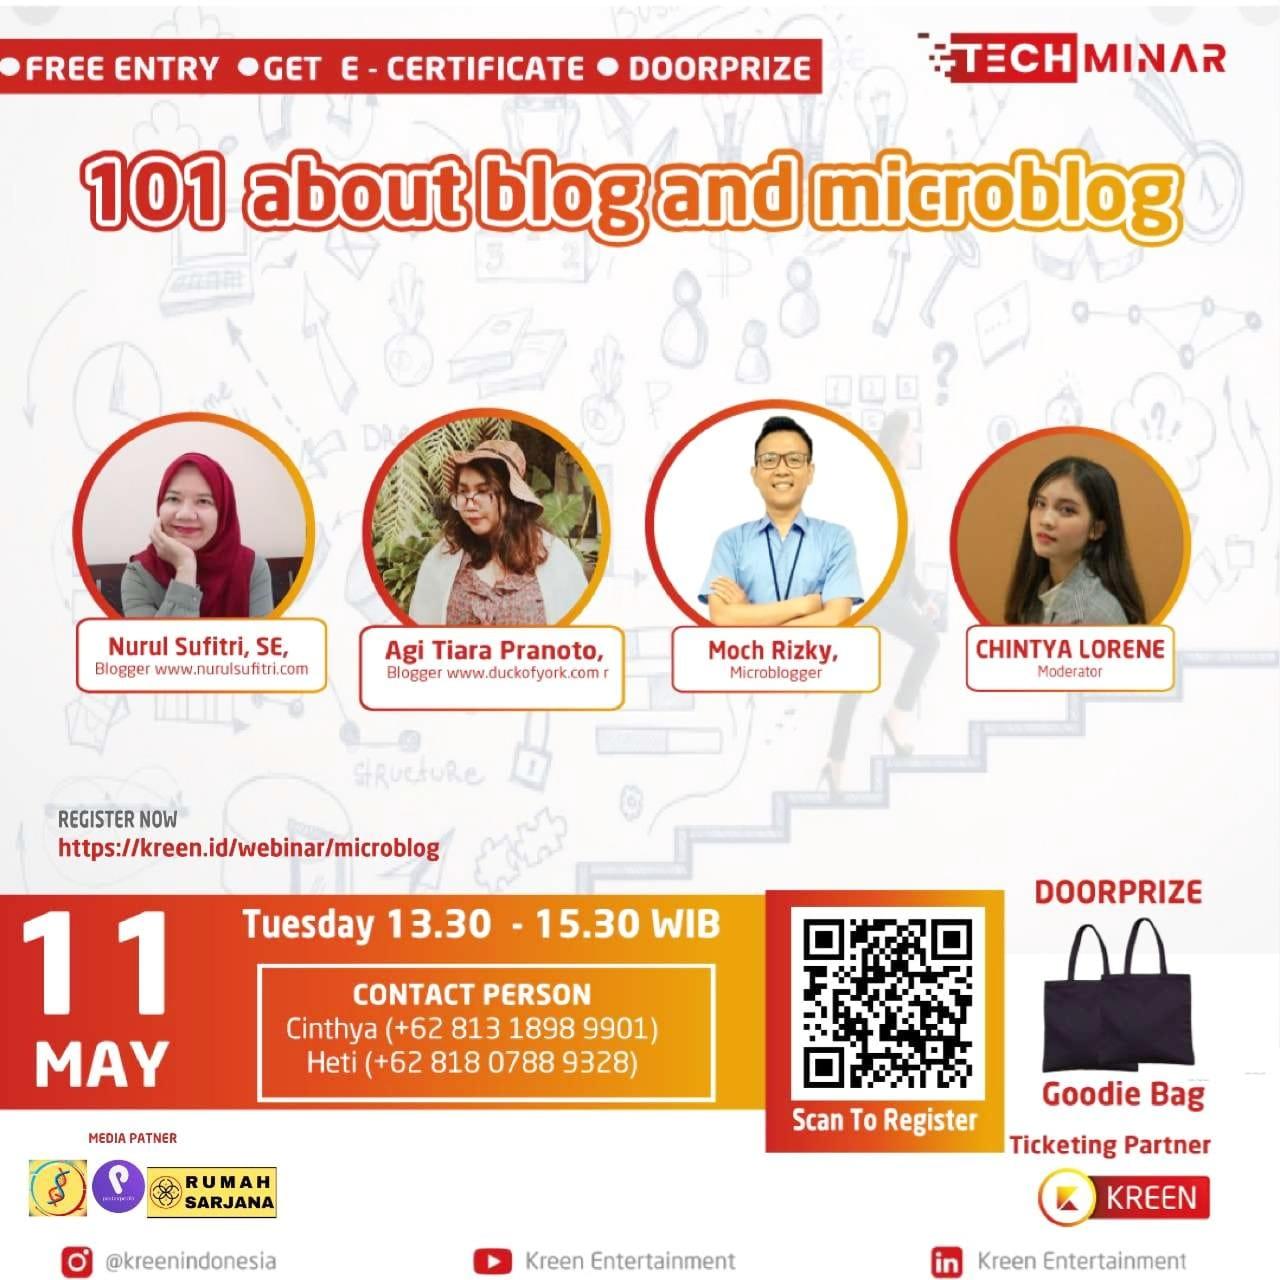 101 About Blog and Microblog Techminar Kreen Indonesia Nurul Sufitri Travel Lifestyle